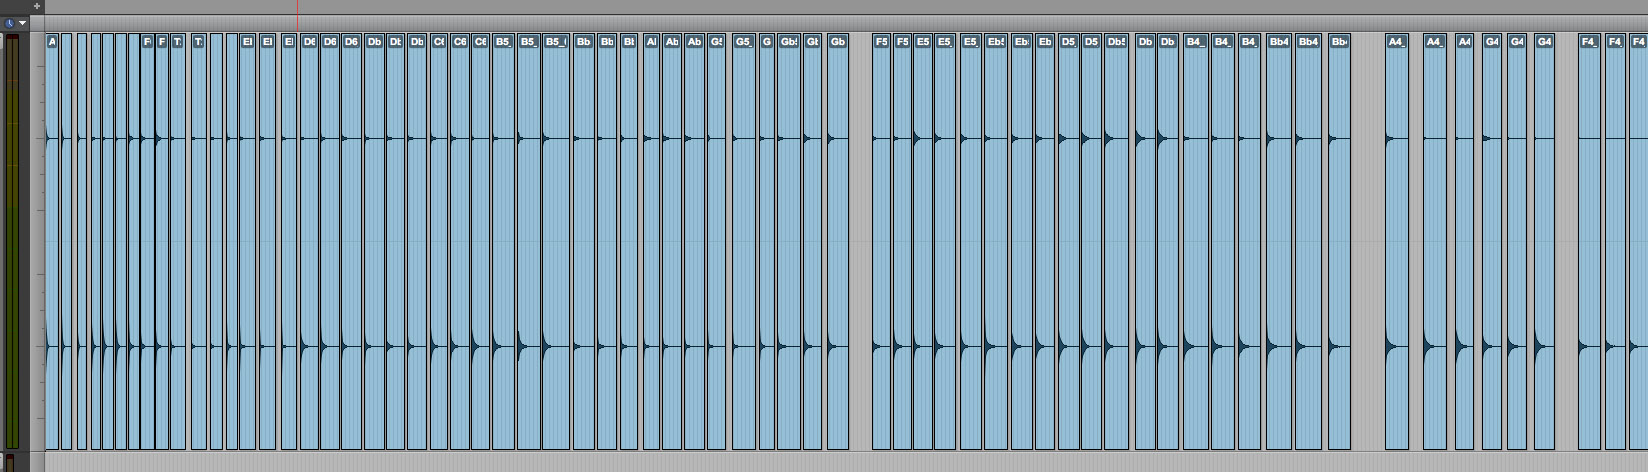 Protools sampling edition